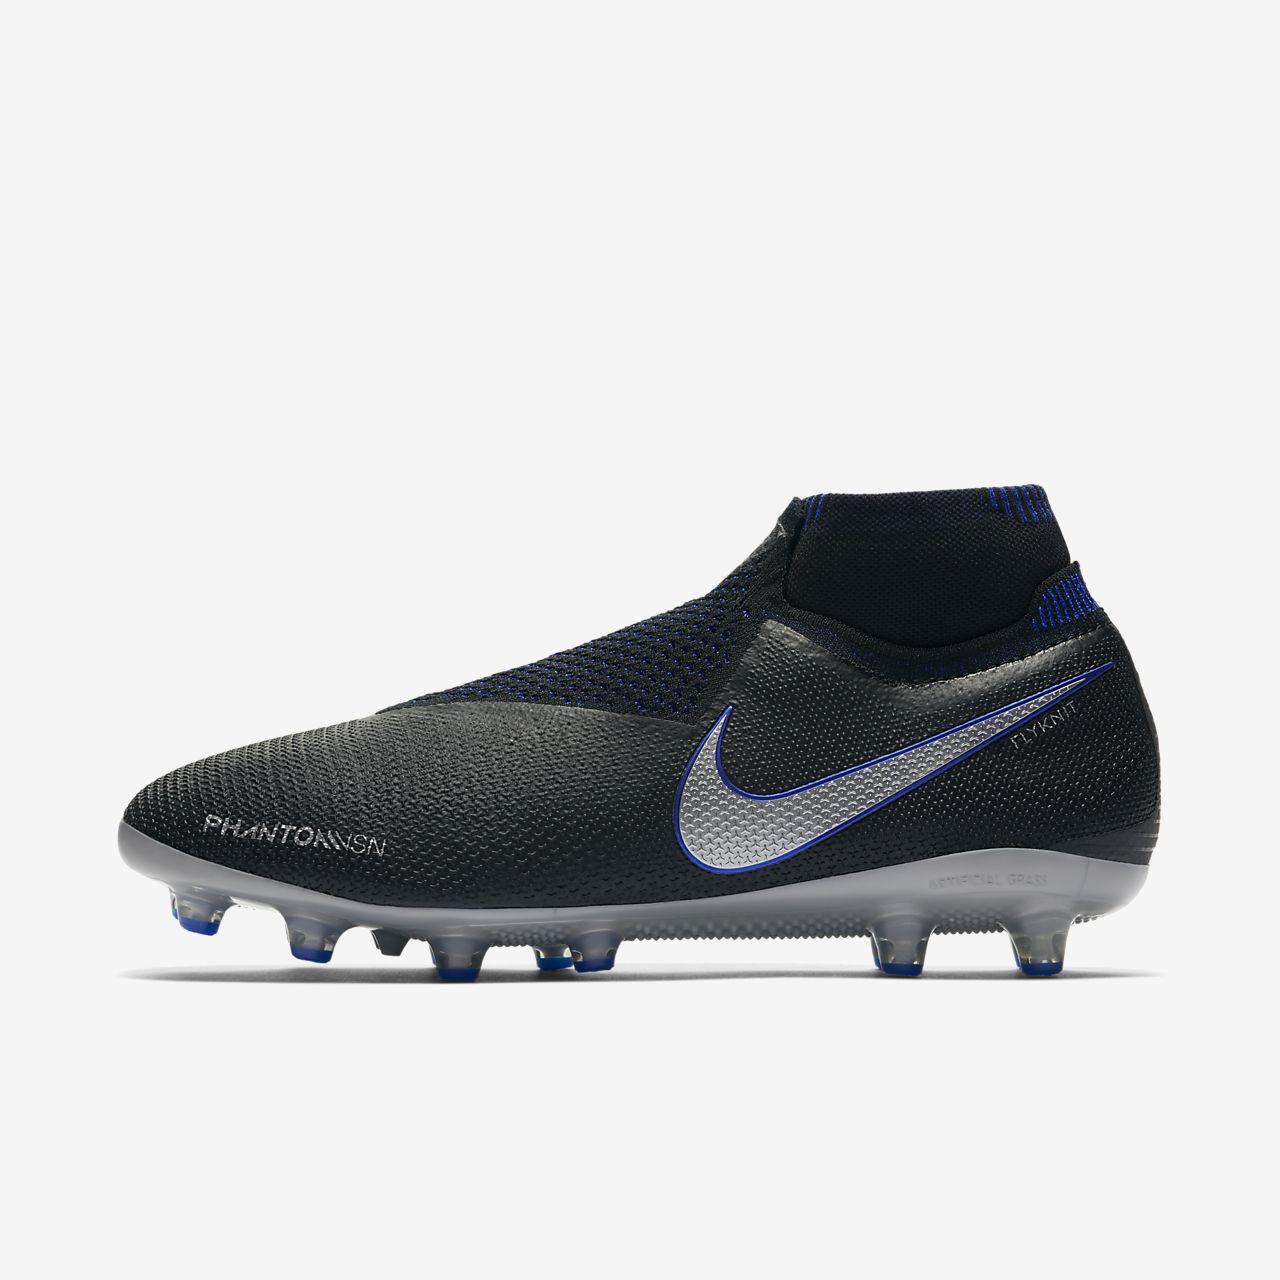 À Nike Chaussure Synthétique Football Terrain Crampons Pour De wn7Zq7E0R1